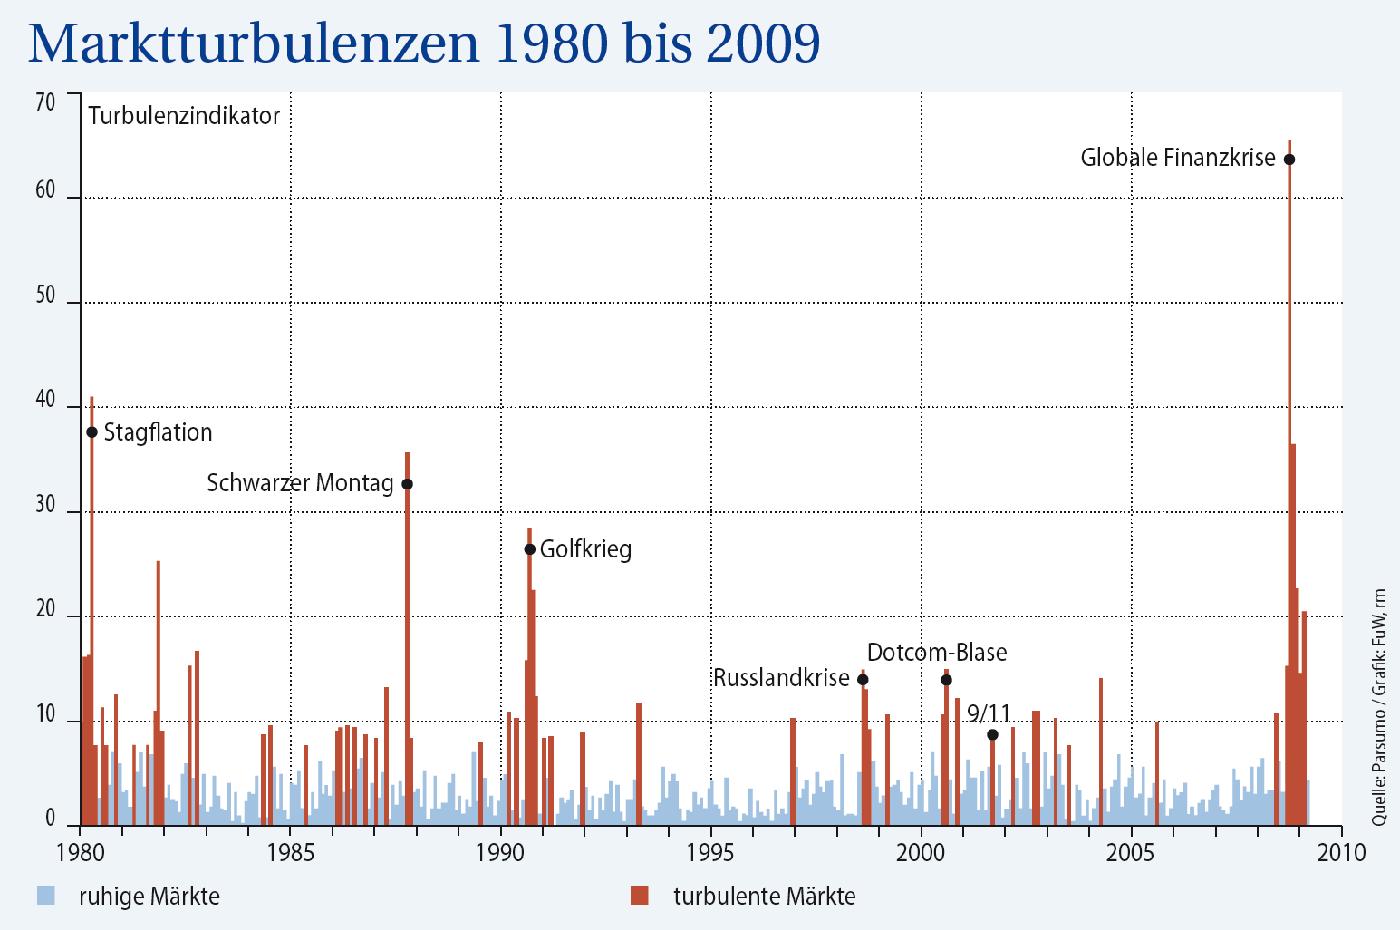 marktturbulenzen-1980-bis-2009-parsumo-capital-ag